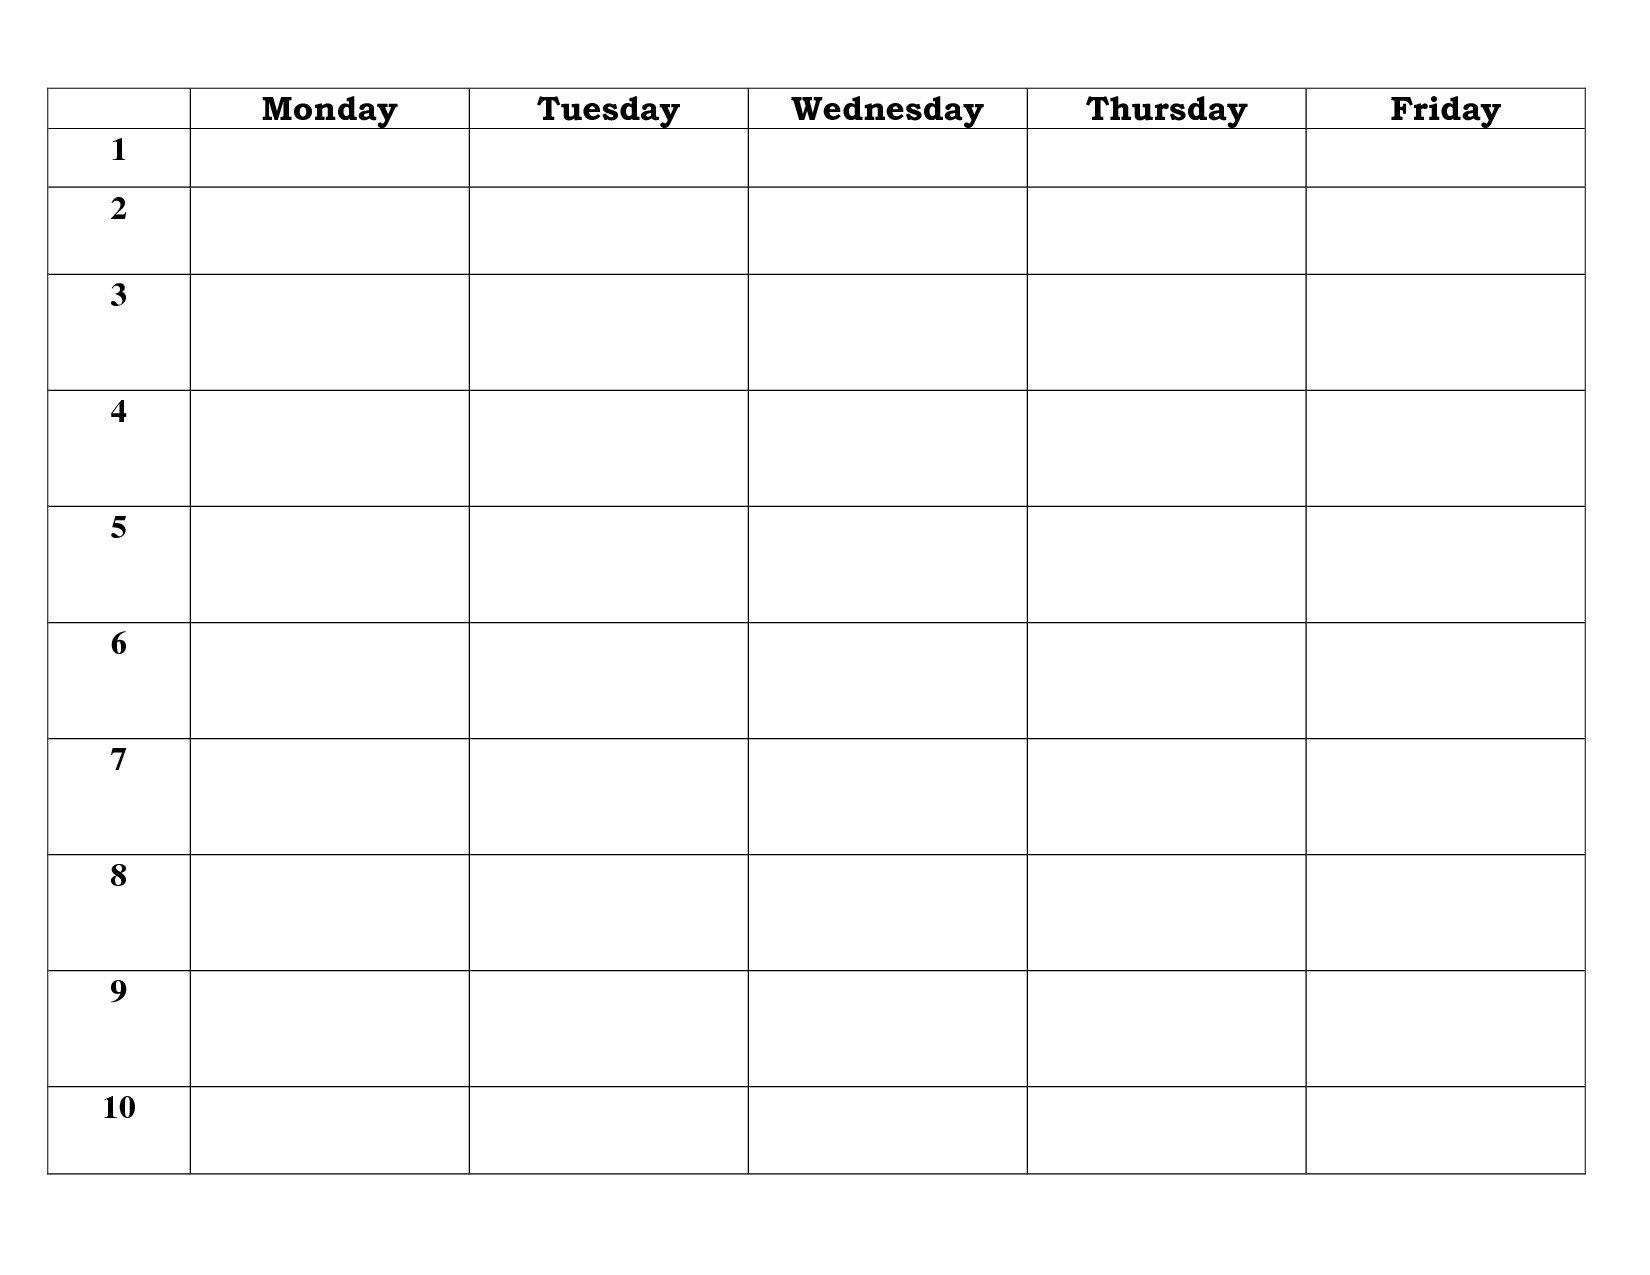 Blank Calendar Template 5 Day - Calendar Inspiration Design Five Day Calendar Template